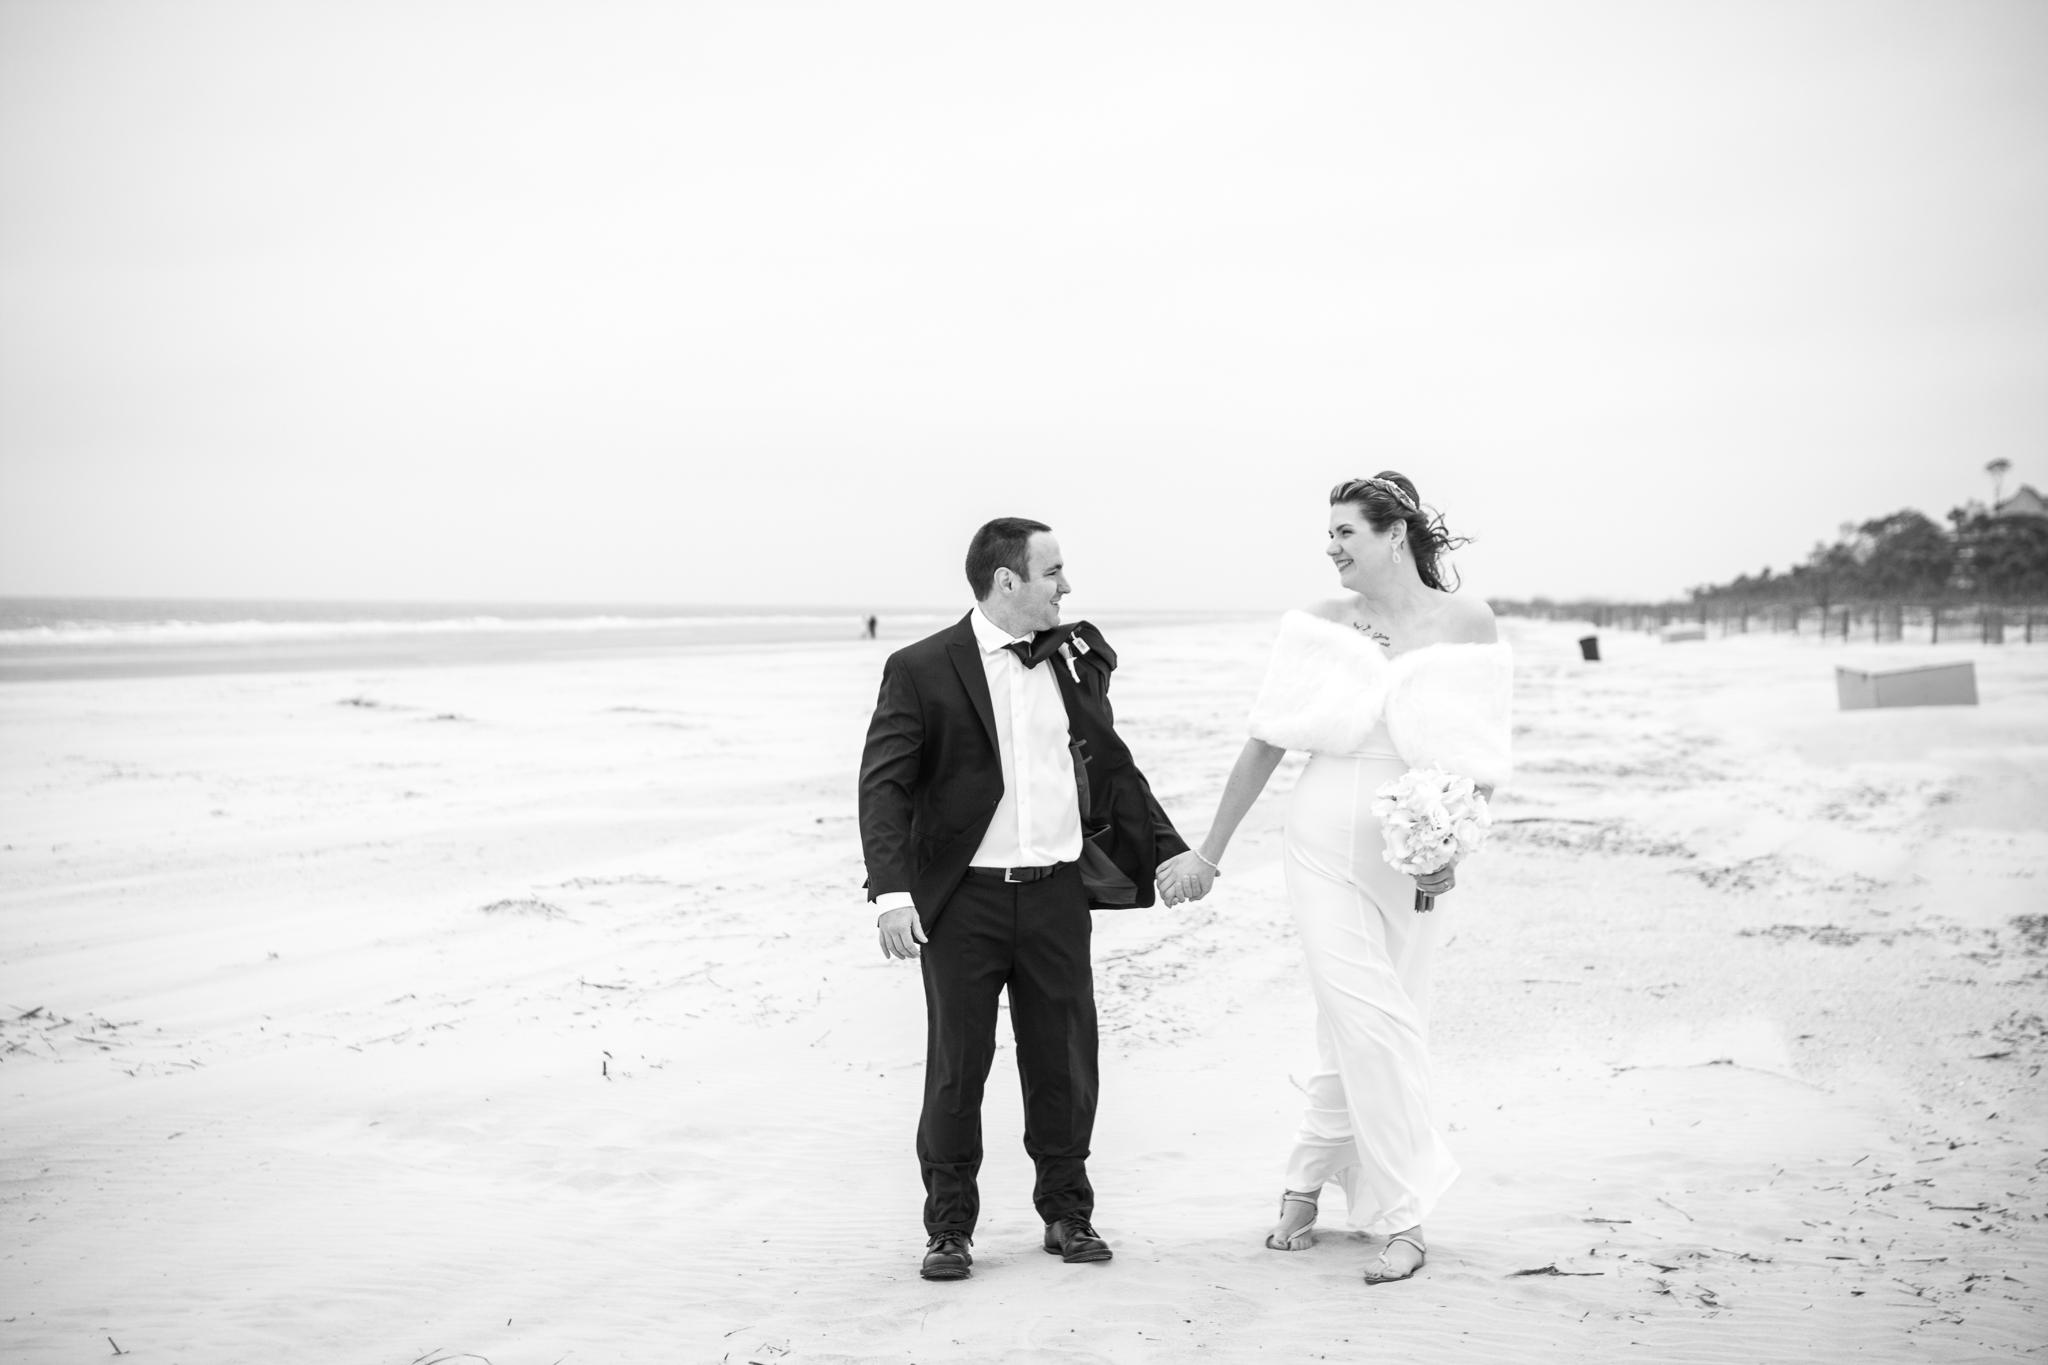 hilton+head+island+elopement-4755.JPG